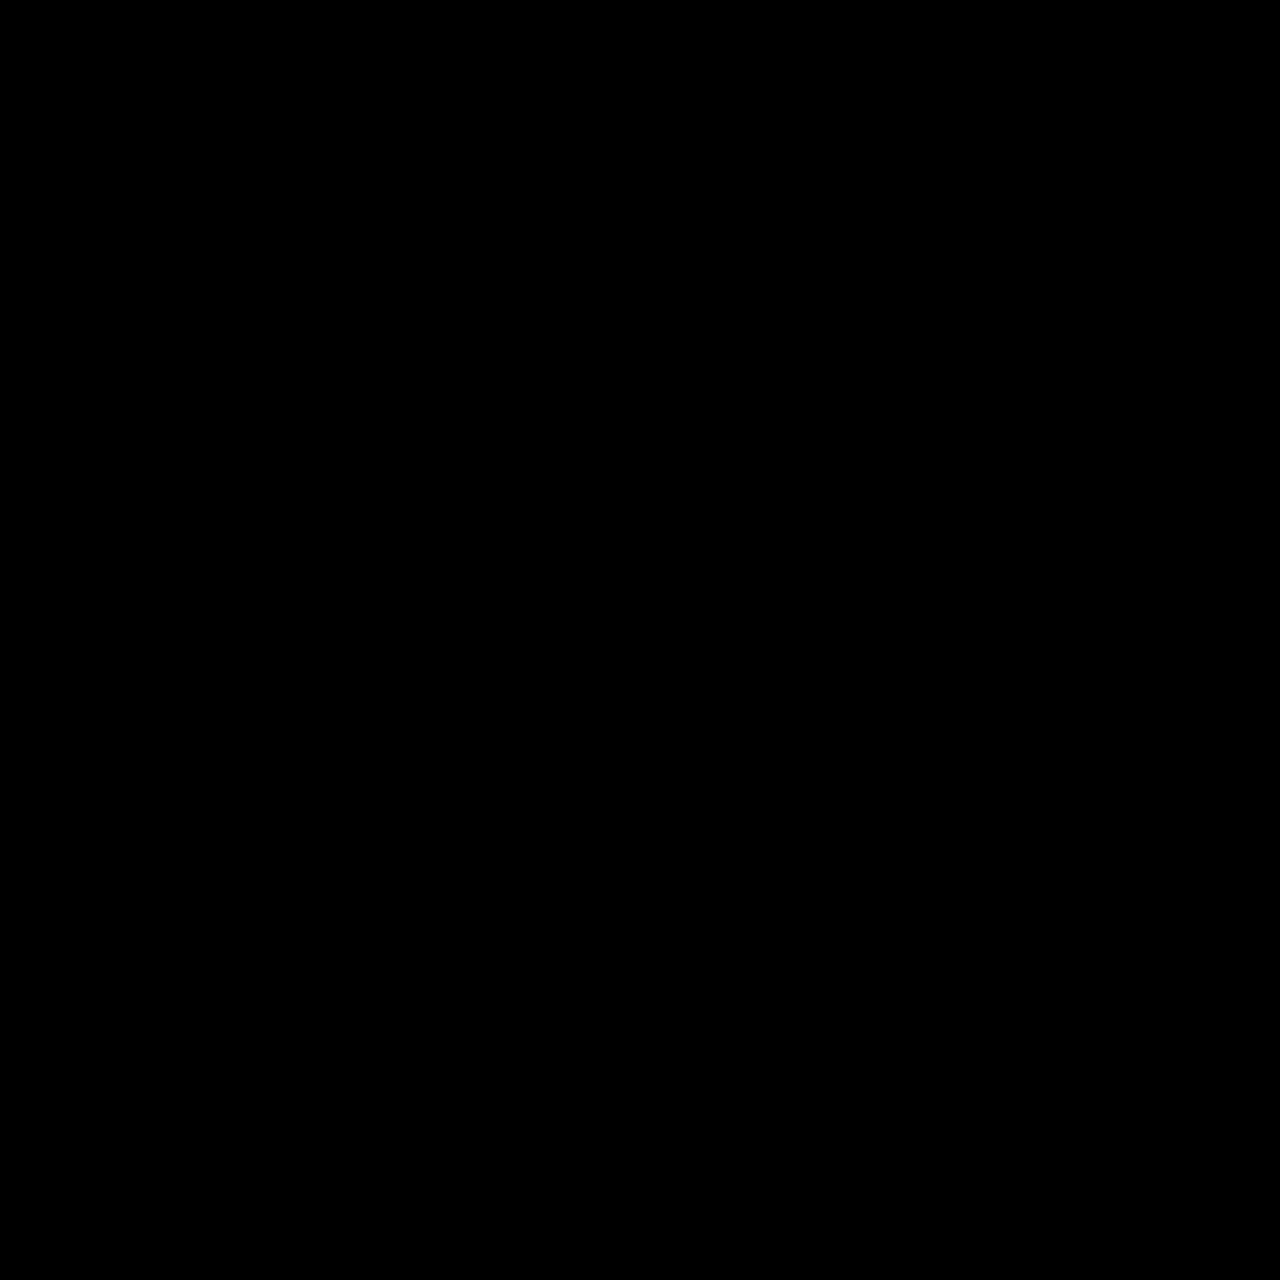 icon-2026950_1280